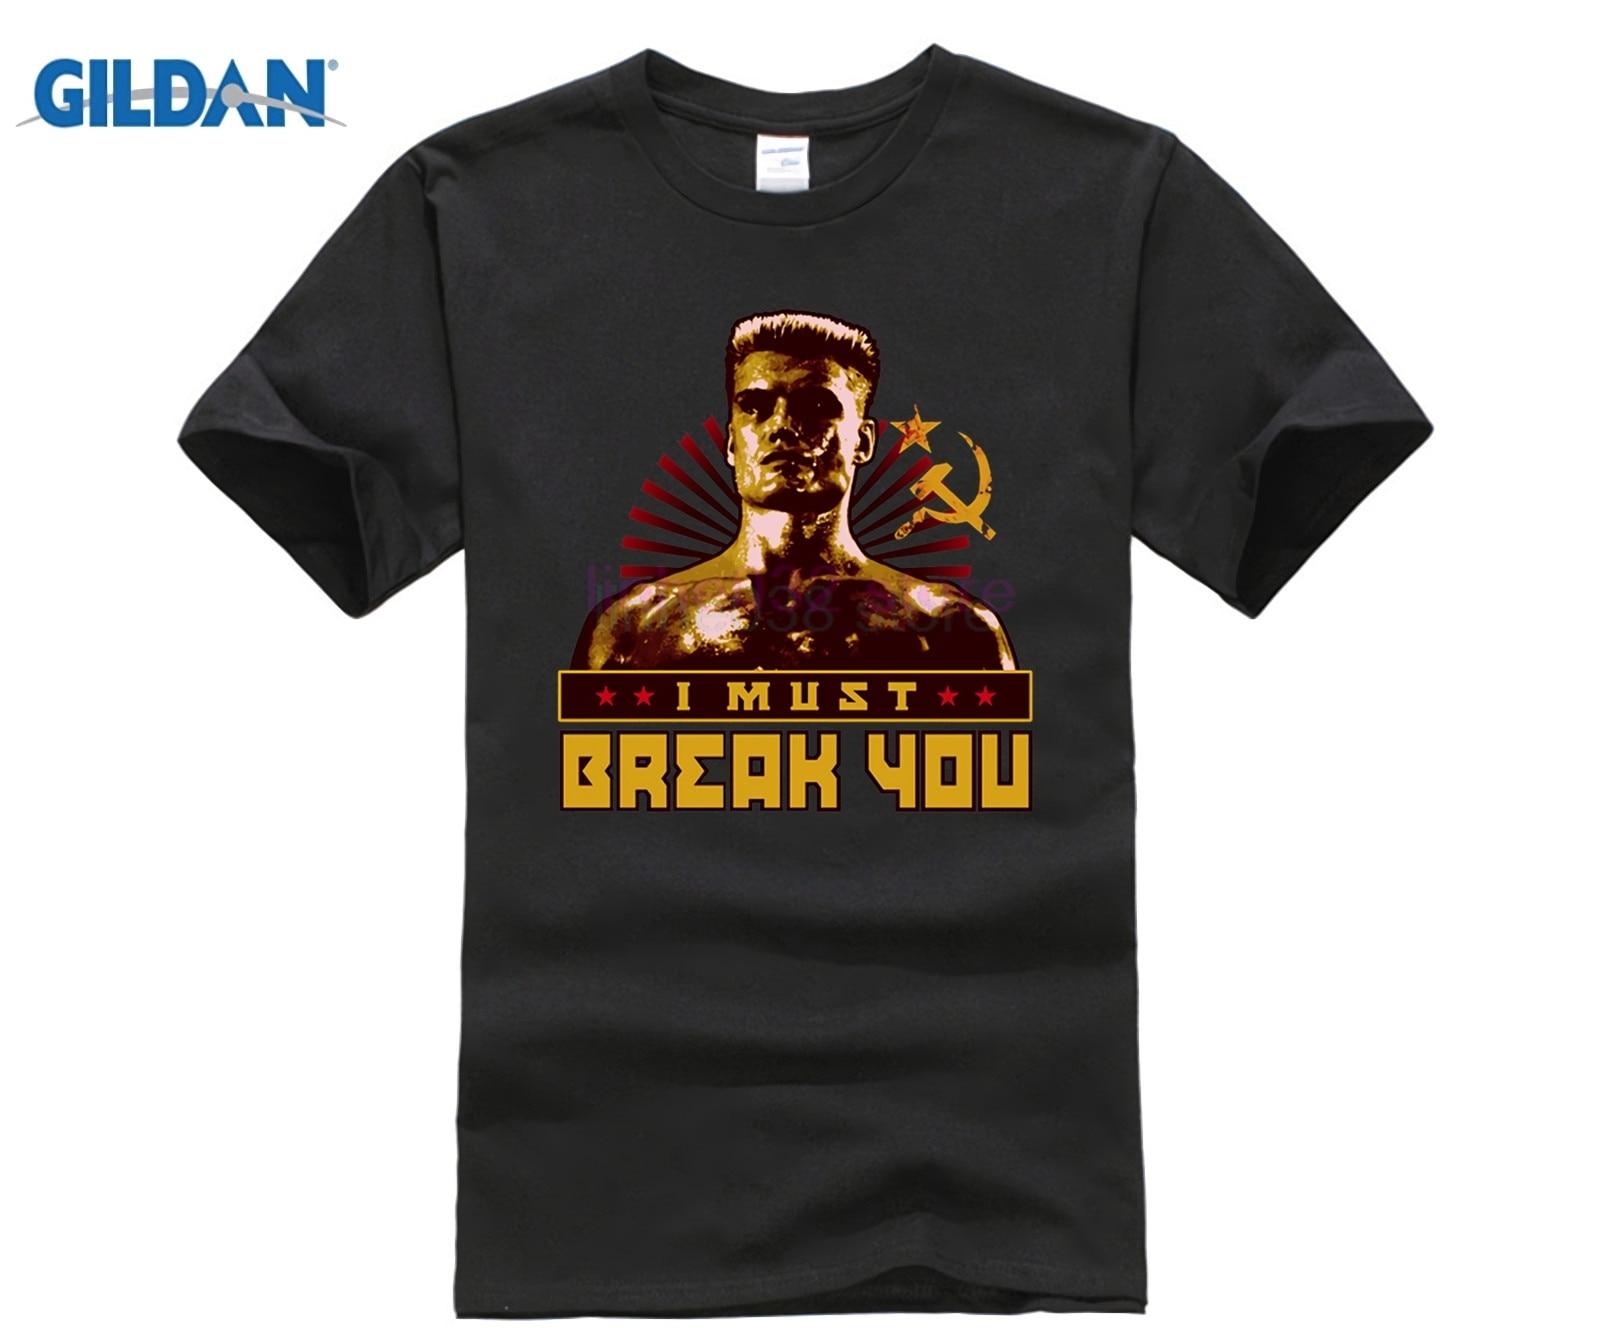 US $9 47 21% OFF GILDAN 2019 NEW brand men shirt Ivan Drago I Must Break  You Rocky T Shirt-in T-Shirts from Men's Clothing on Aliexpress com    Alibaba